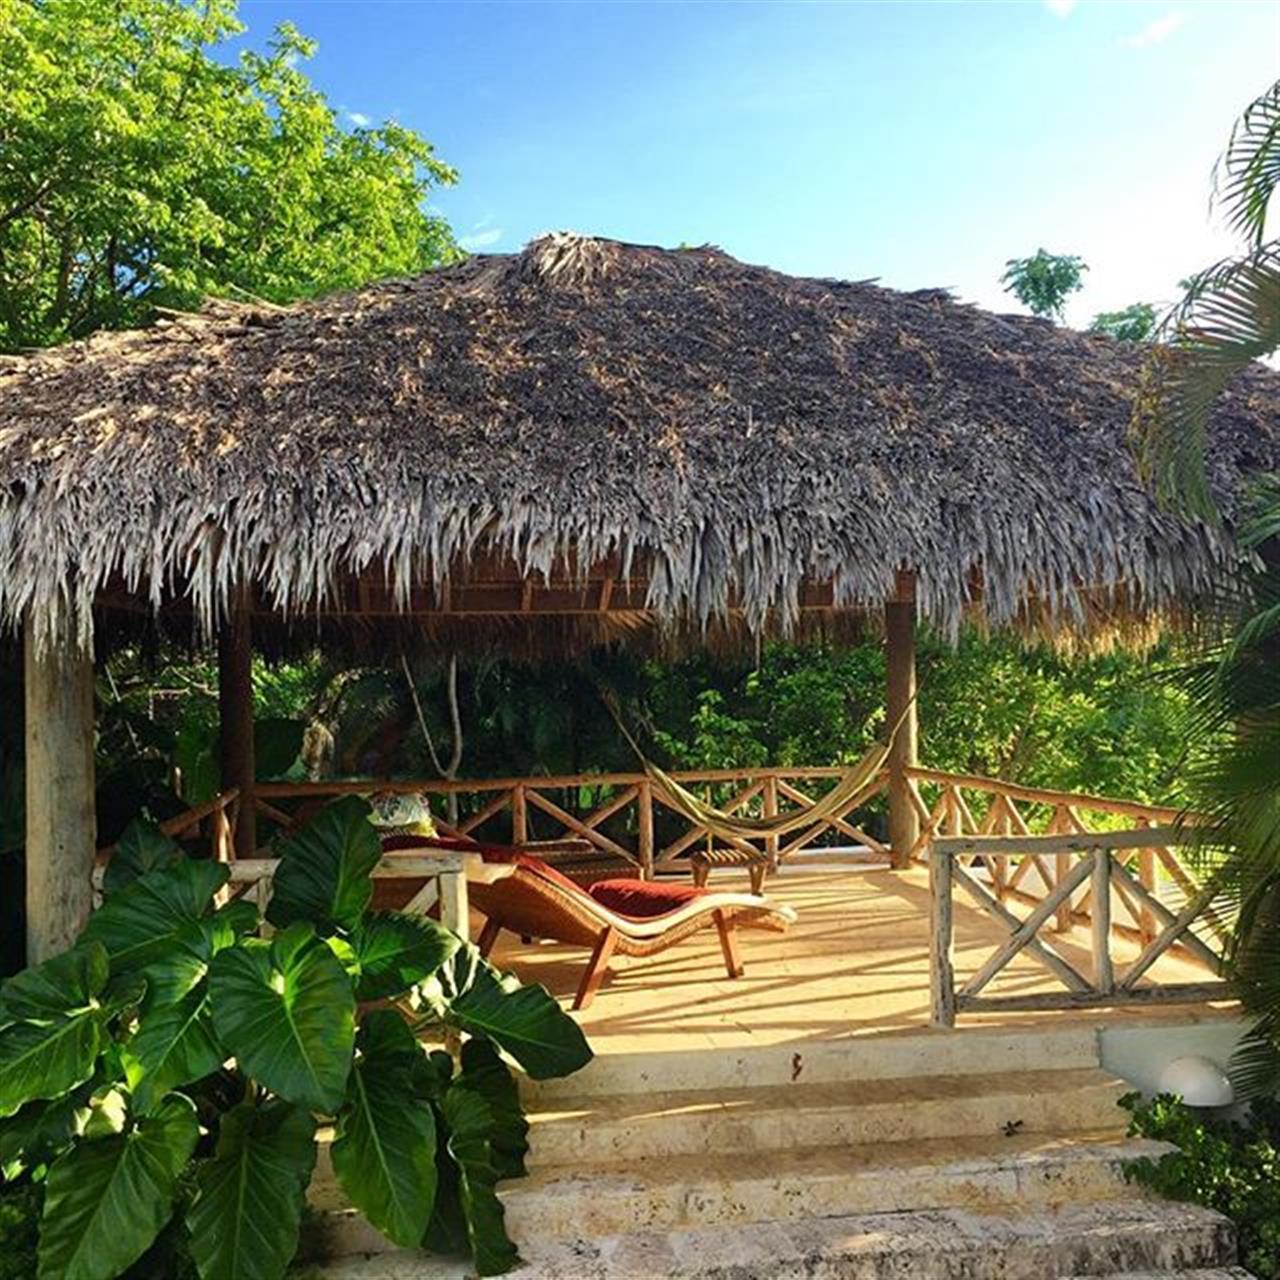 Outdoor Living! ???? #dominicanrepublic #leadingrelocal